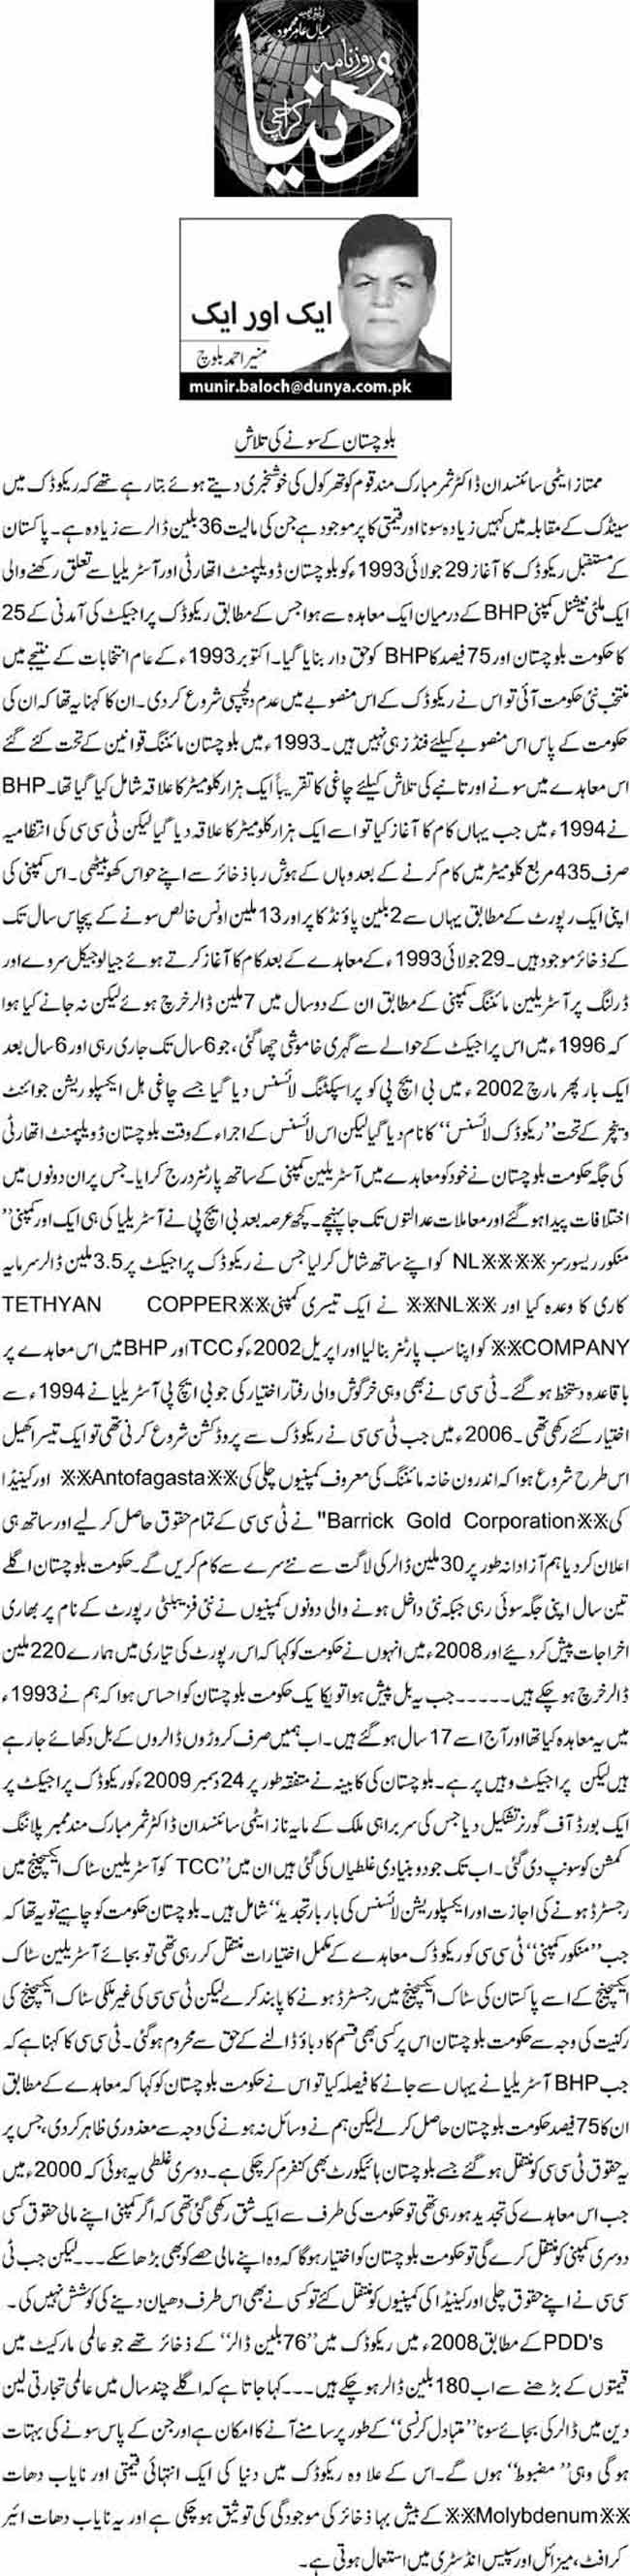 Balochistan k sonay ki talash - Munir AHmed Baloch